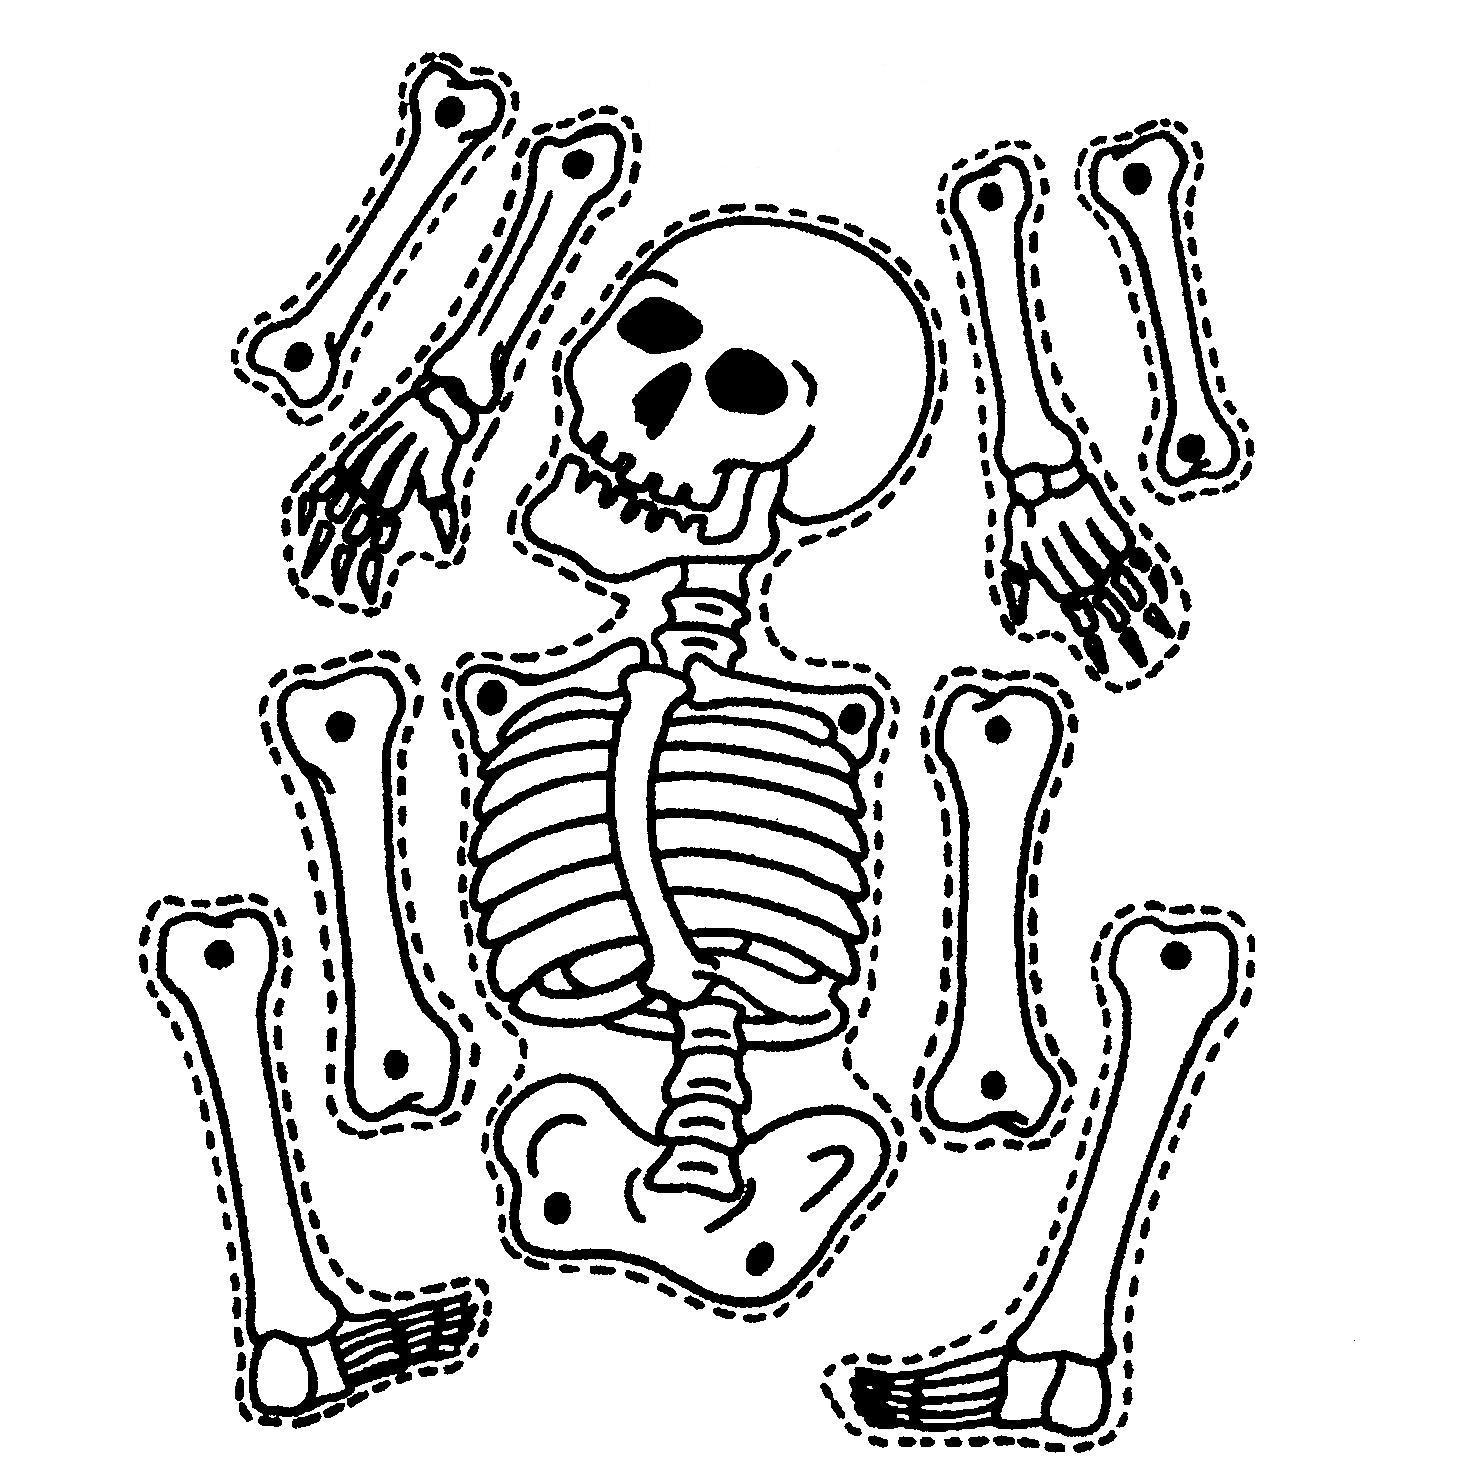 Human Skeletal System Drawing At Getdrawings